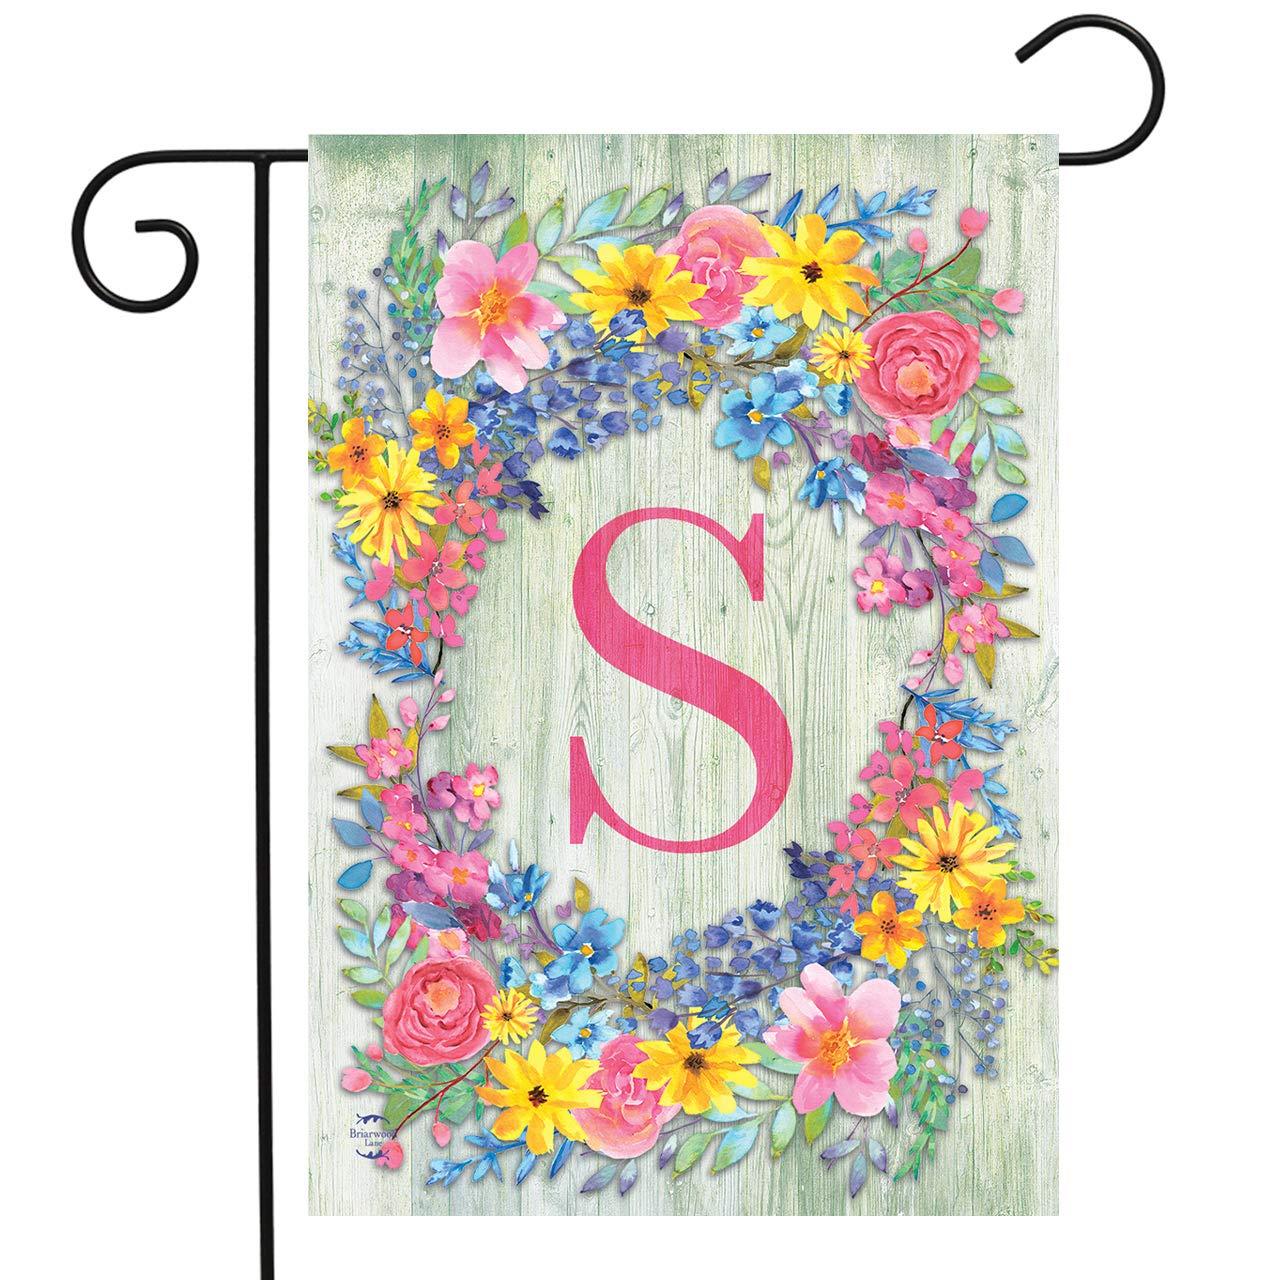 "Briarwood Lane Spring Monogram Letter S Garden Flag Floral Wreath 12.5"" x 18"""